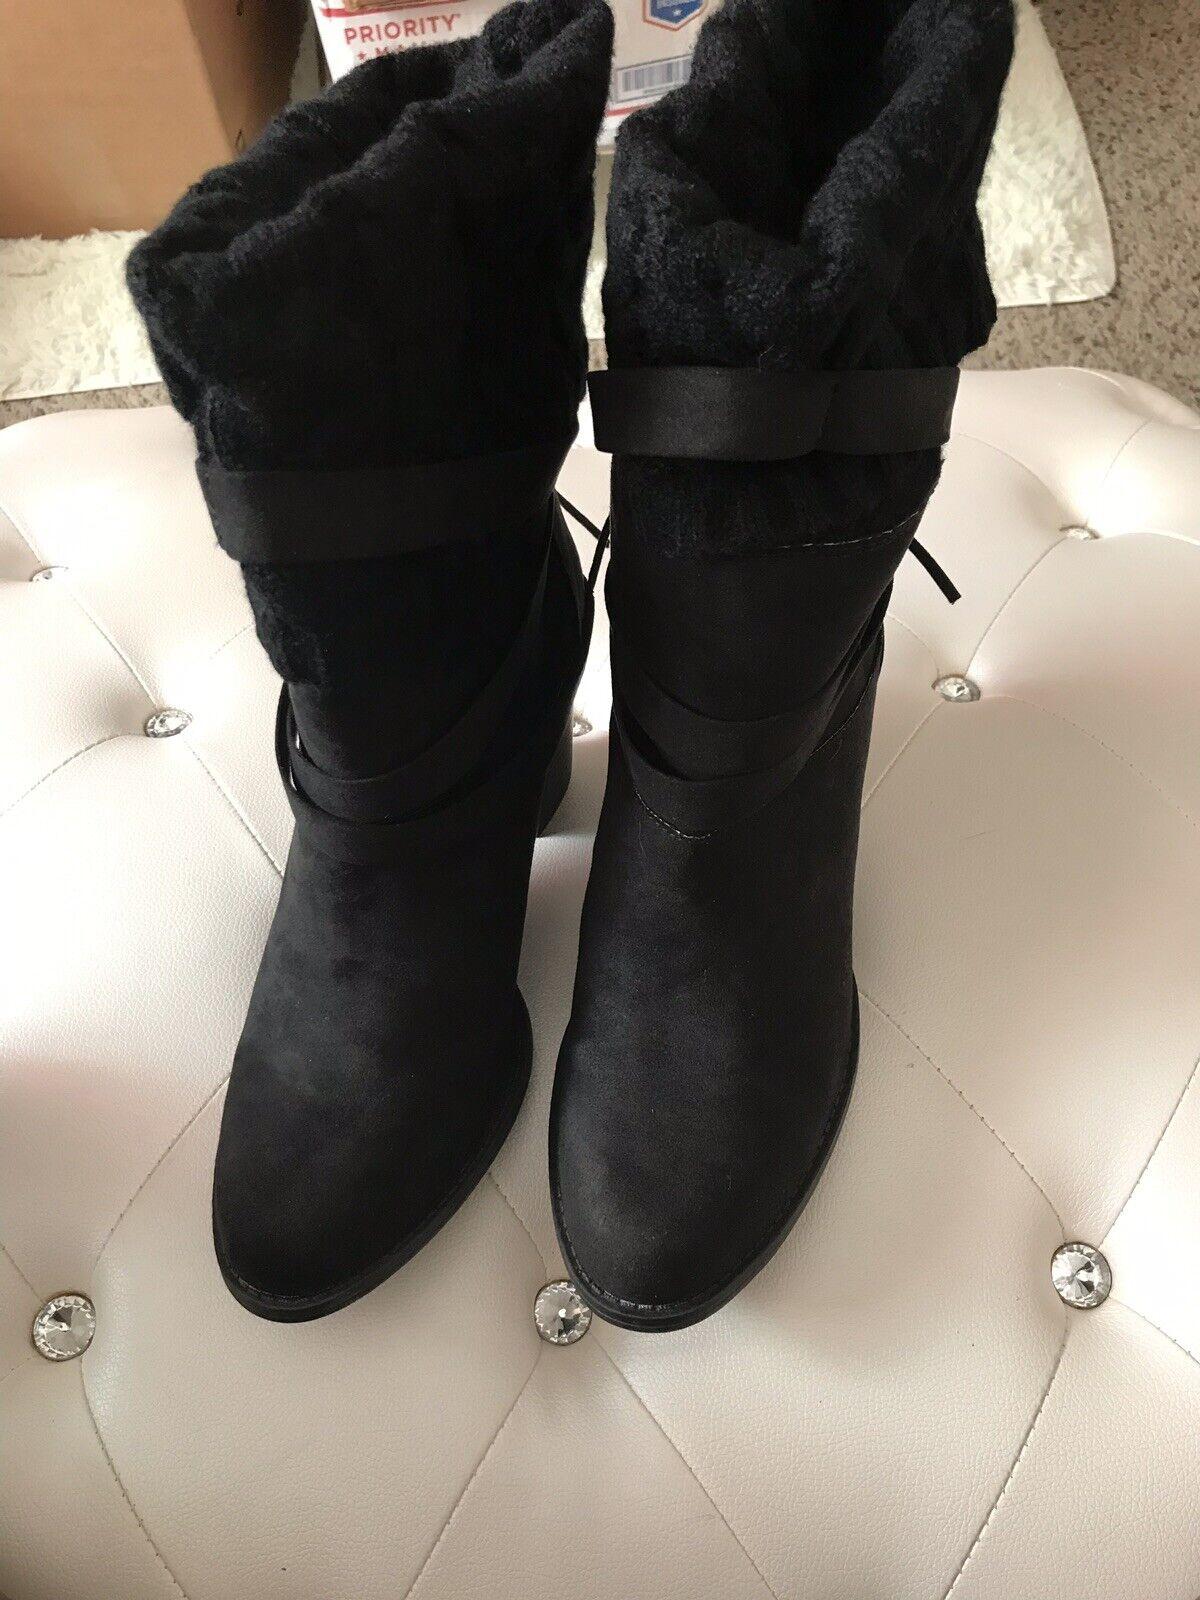 NEW shoes Dazzle Deyona Black Faux Suede Sock Booties 11M  62.95